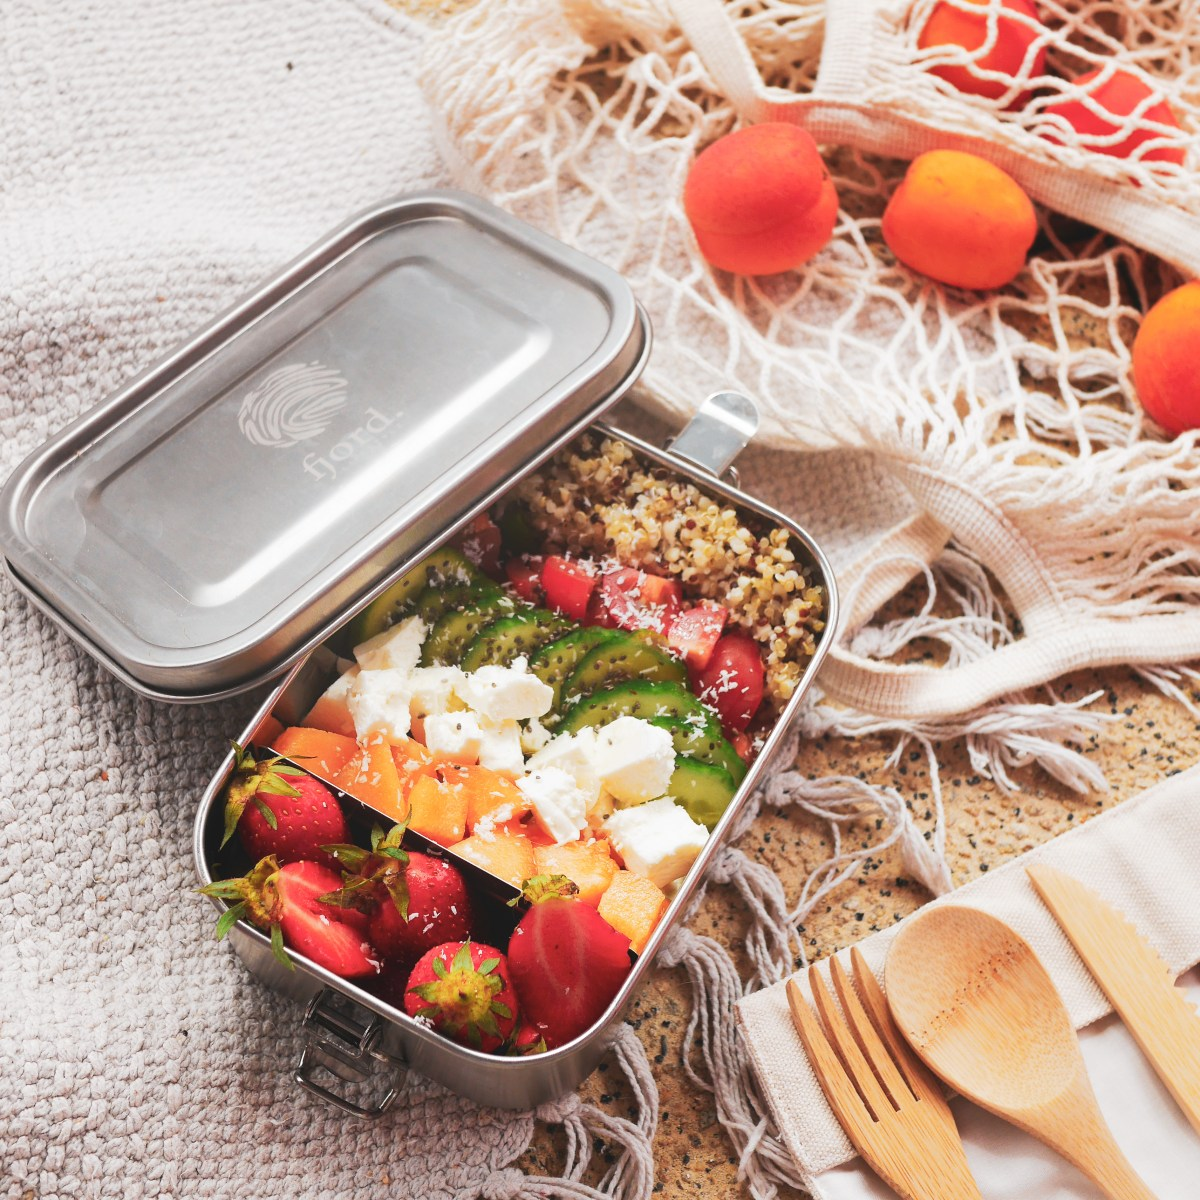 Beach-bowl-lunch-box-fjord-lifestyle